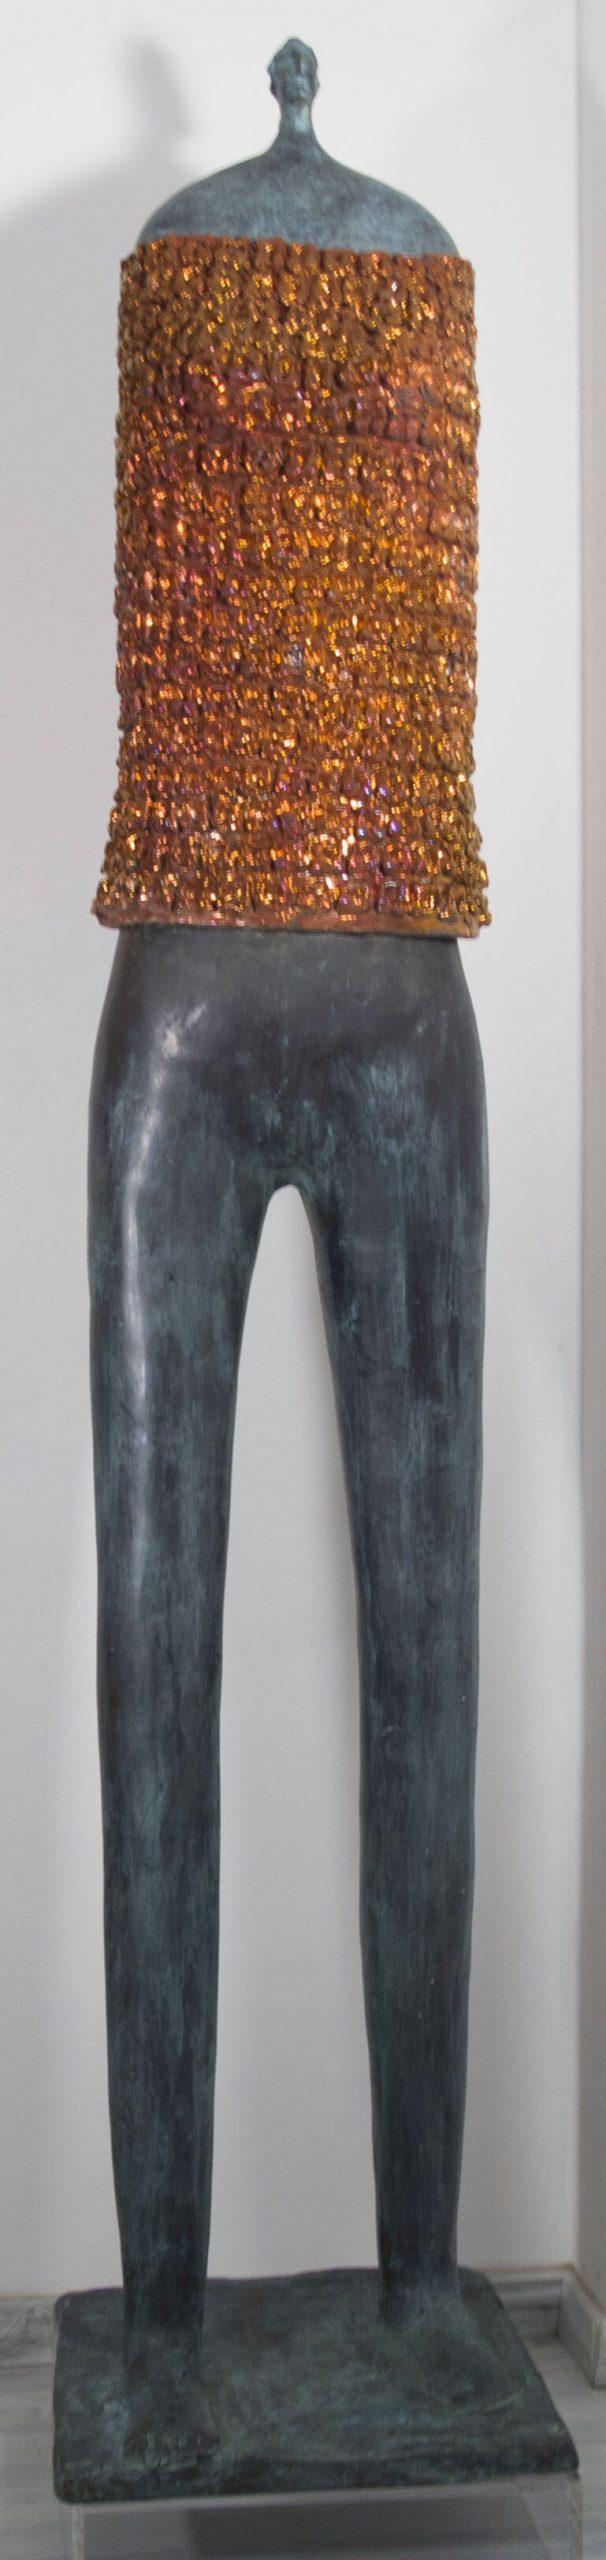 Guerriero-donna---41x39x198cm---Bronzo-e-ceramica---1_1